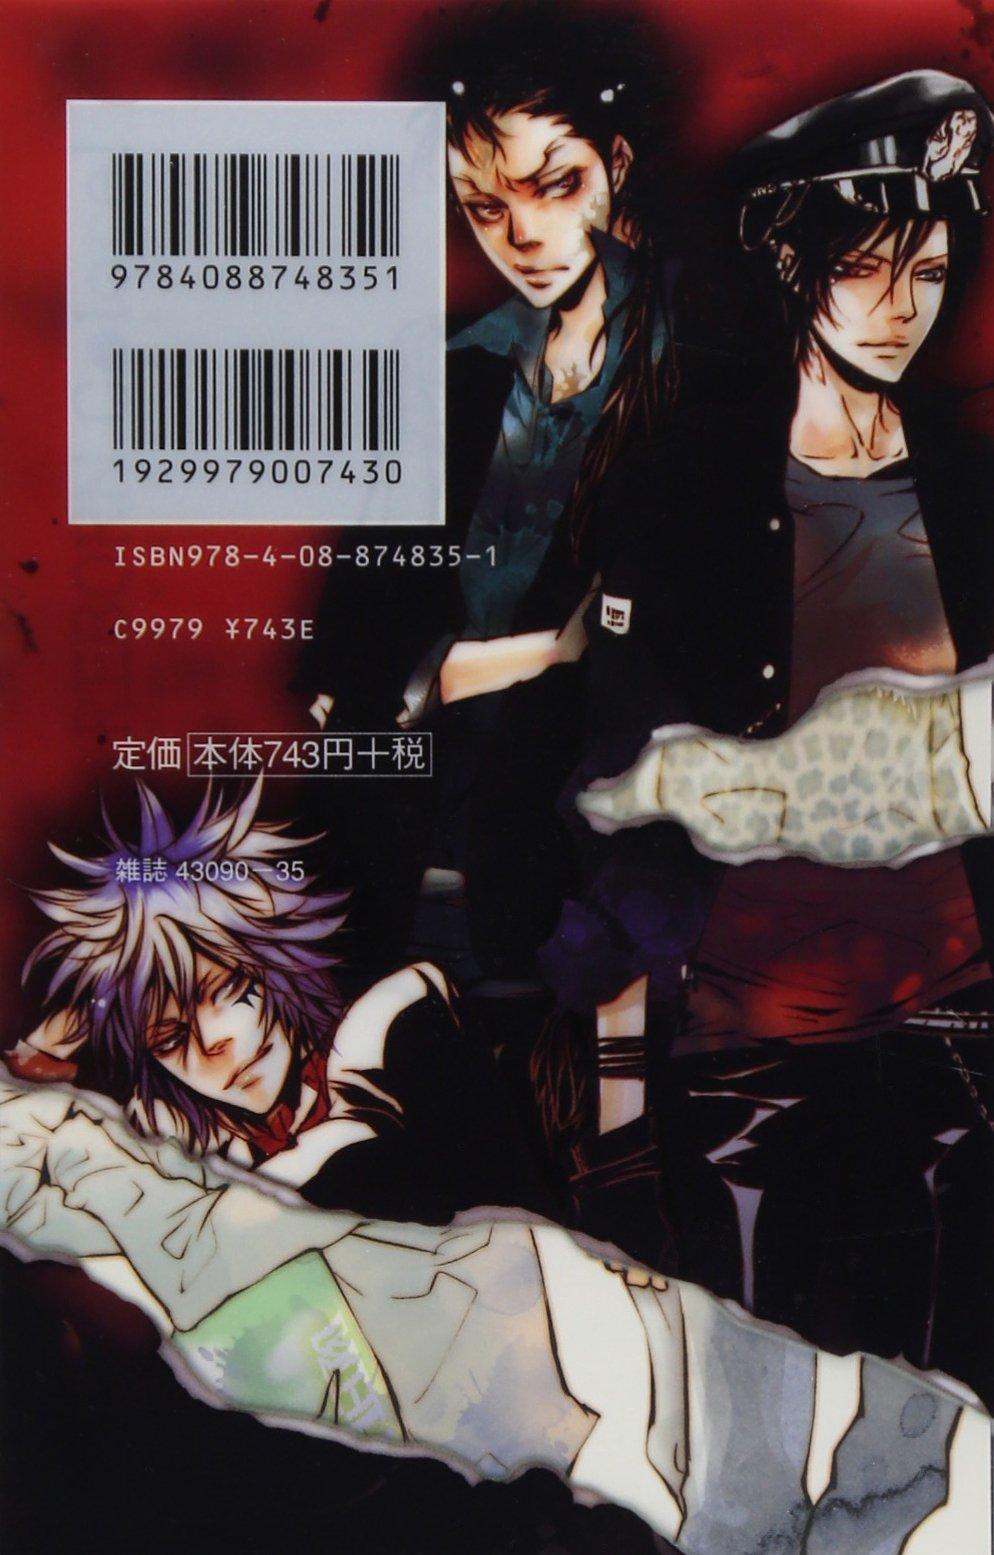 Katekyo Hitman Reborn Official Visual Book Reborn Colore Jump Comics